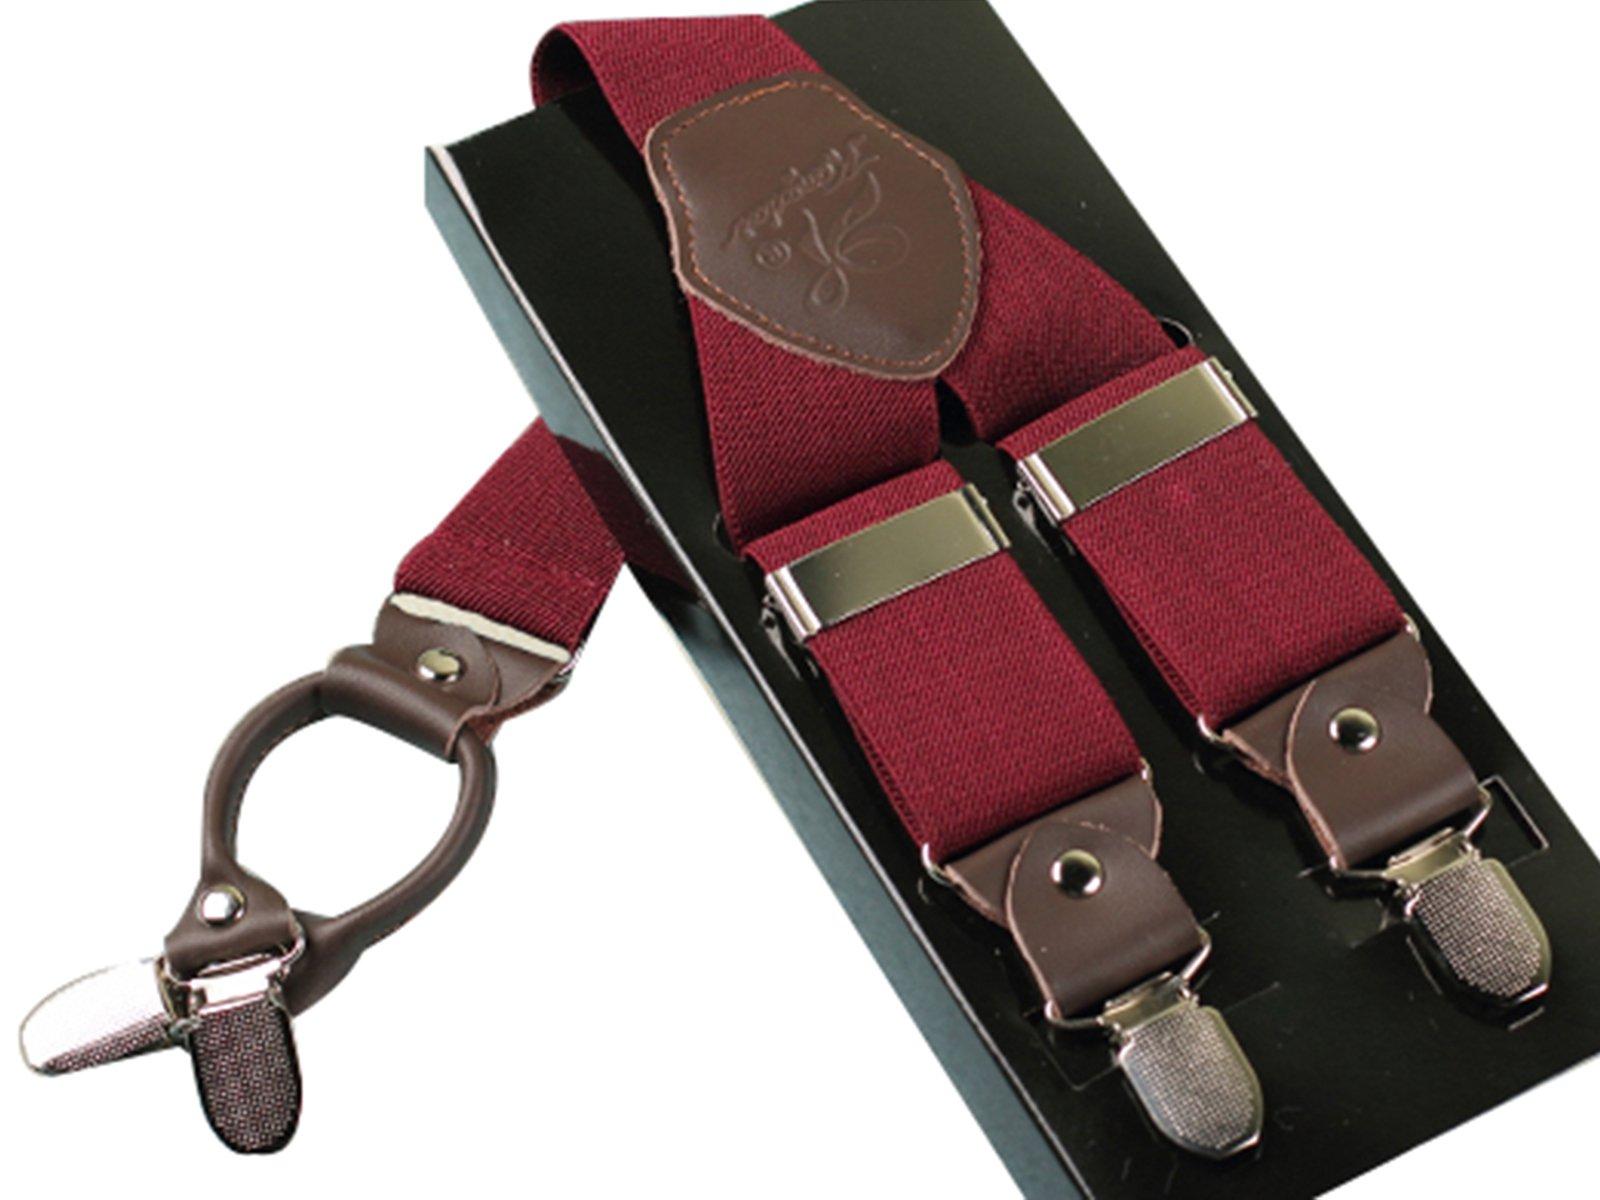 Panegy Men's Solid Suspender Adjustable Y-Shape Suit Brace with 4 Metal Clips (Wine Red)